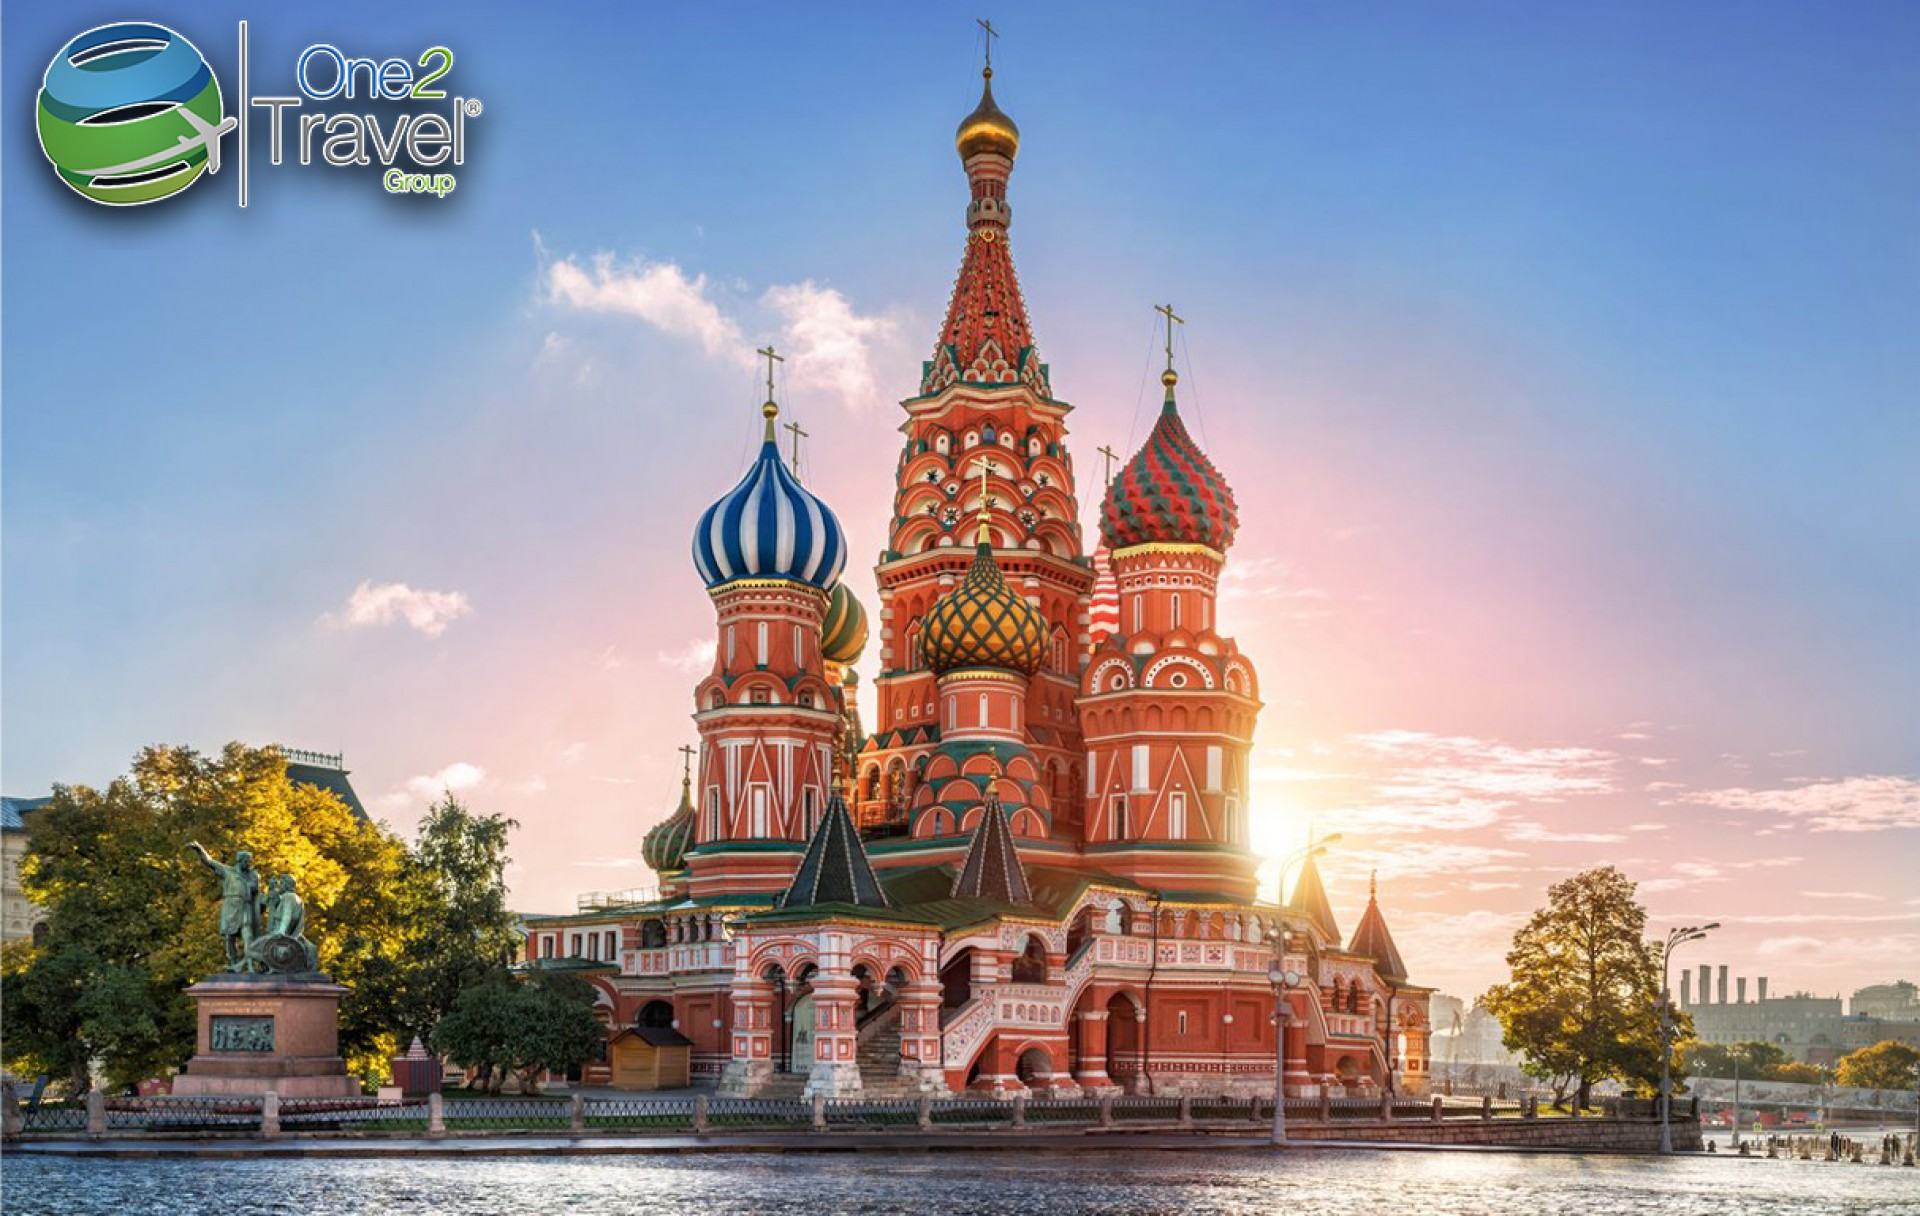 ¡Visas electrónicas para vistar Rusia!